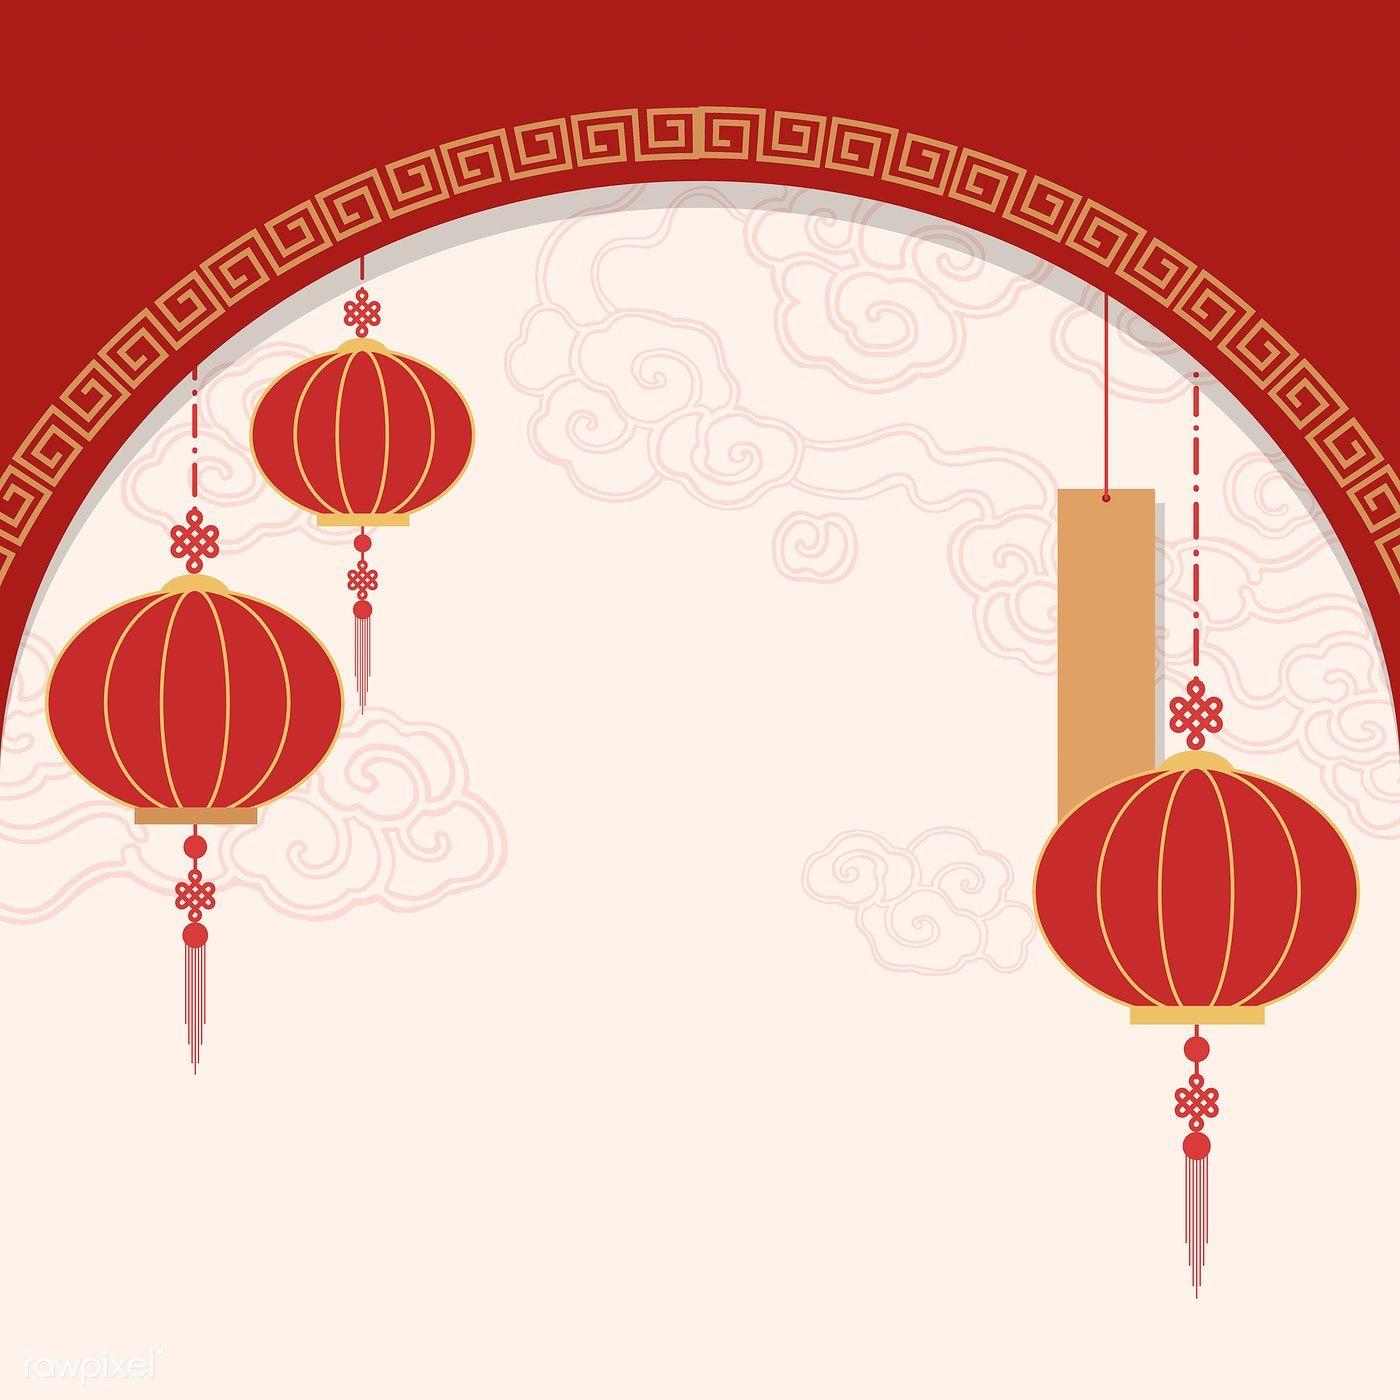 Chinese new year 2019 greeting background